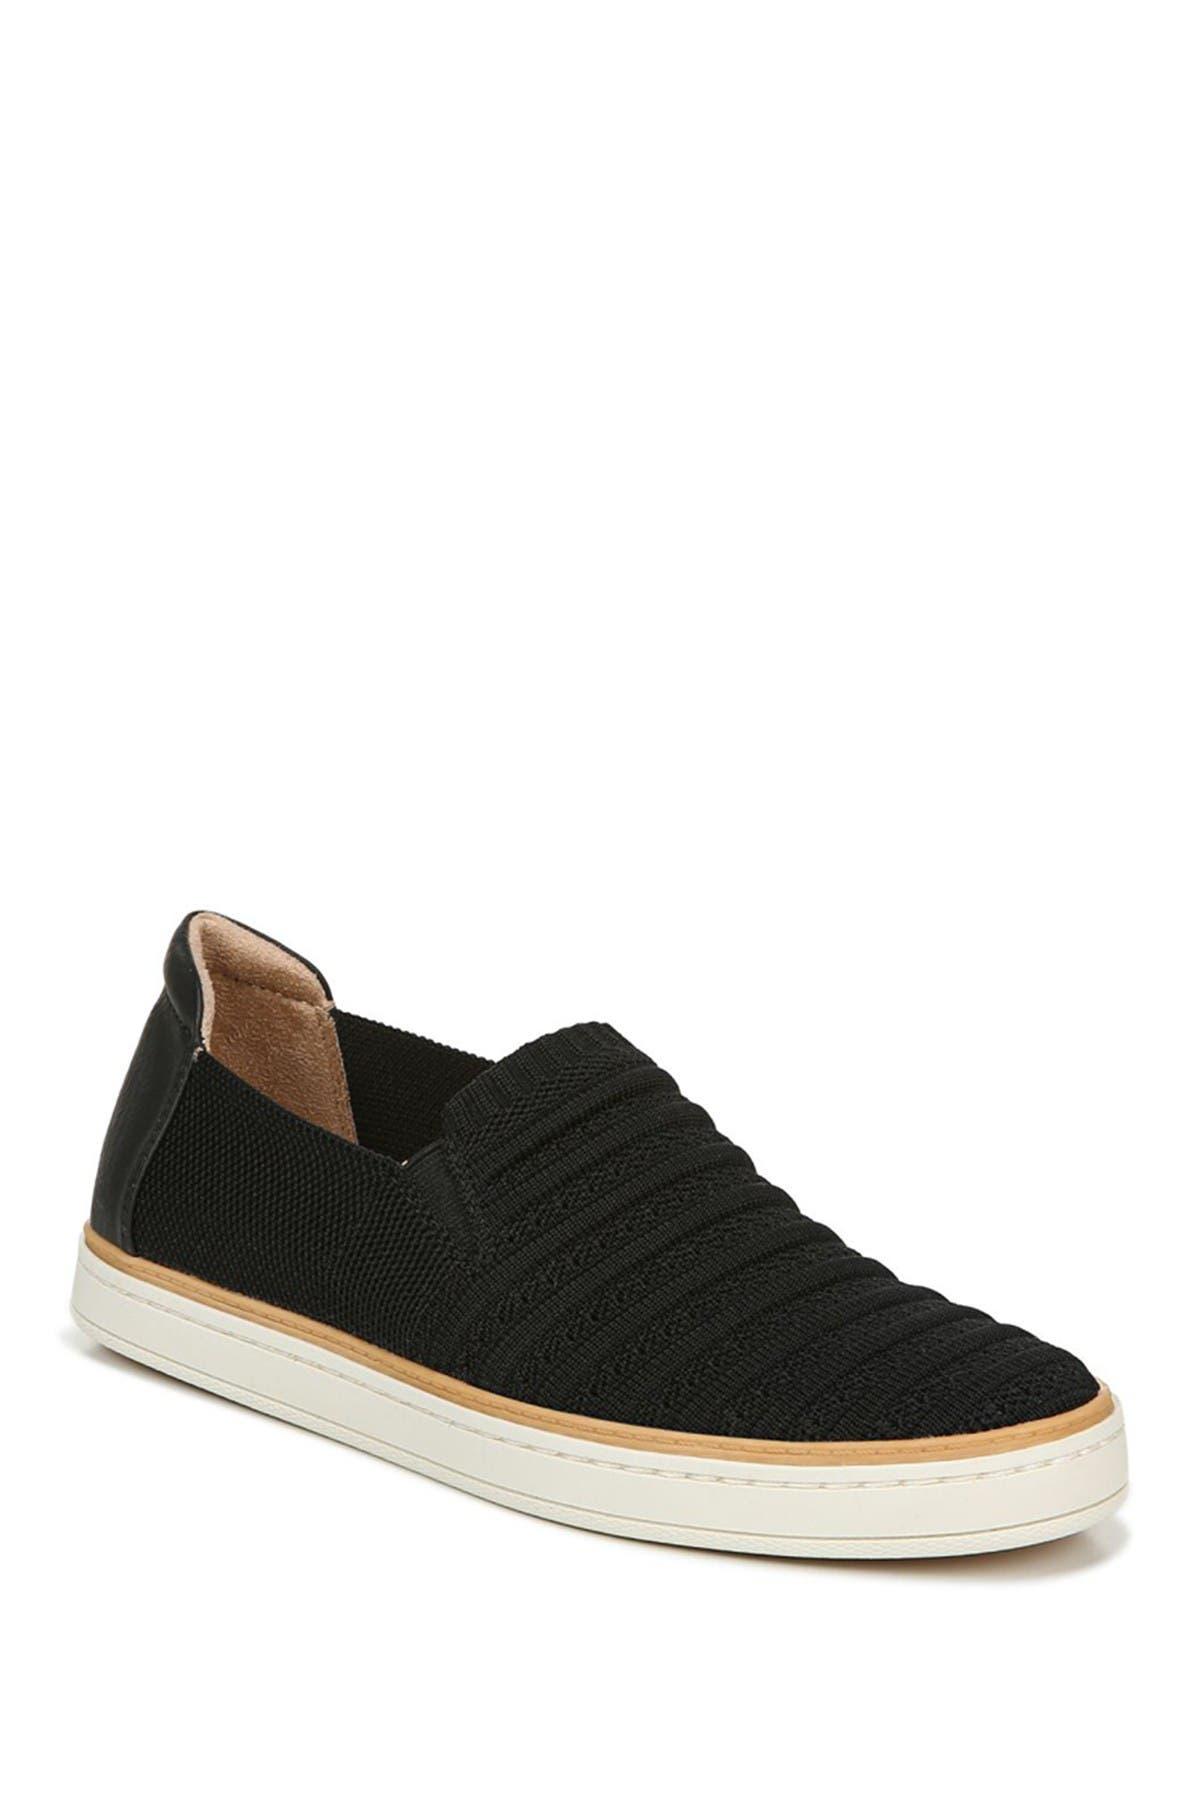 Image of SOUL Naturalizer Kemper Knit Slip-On Sneaker